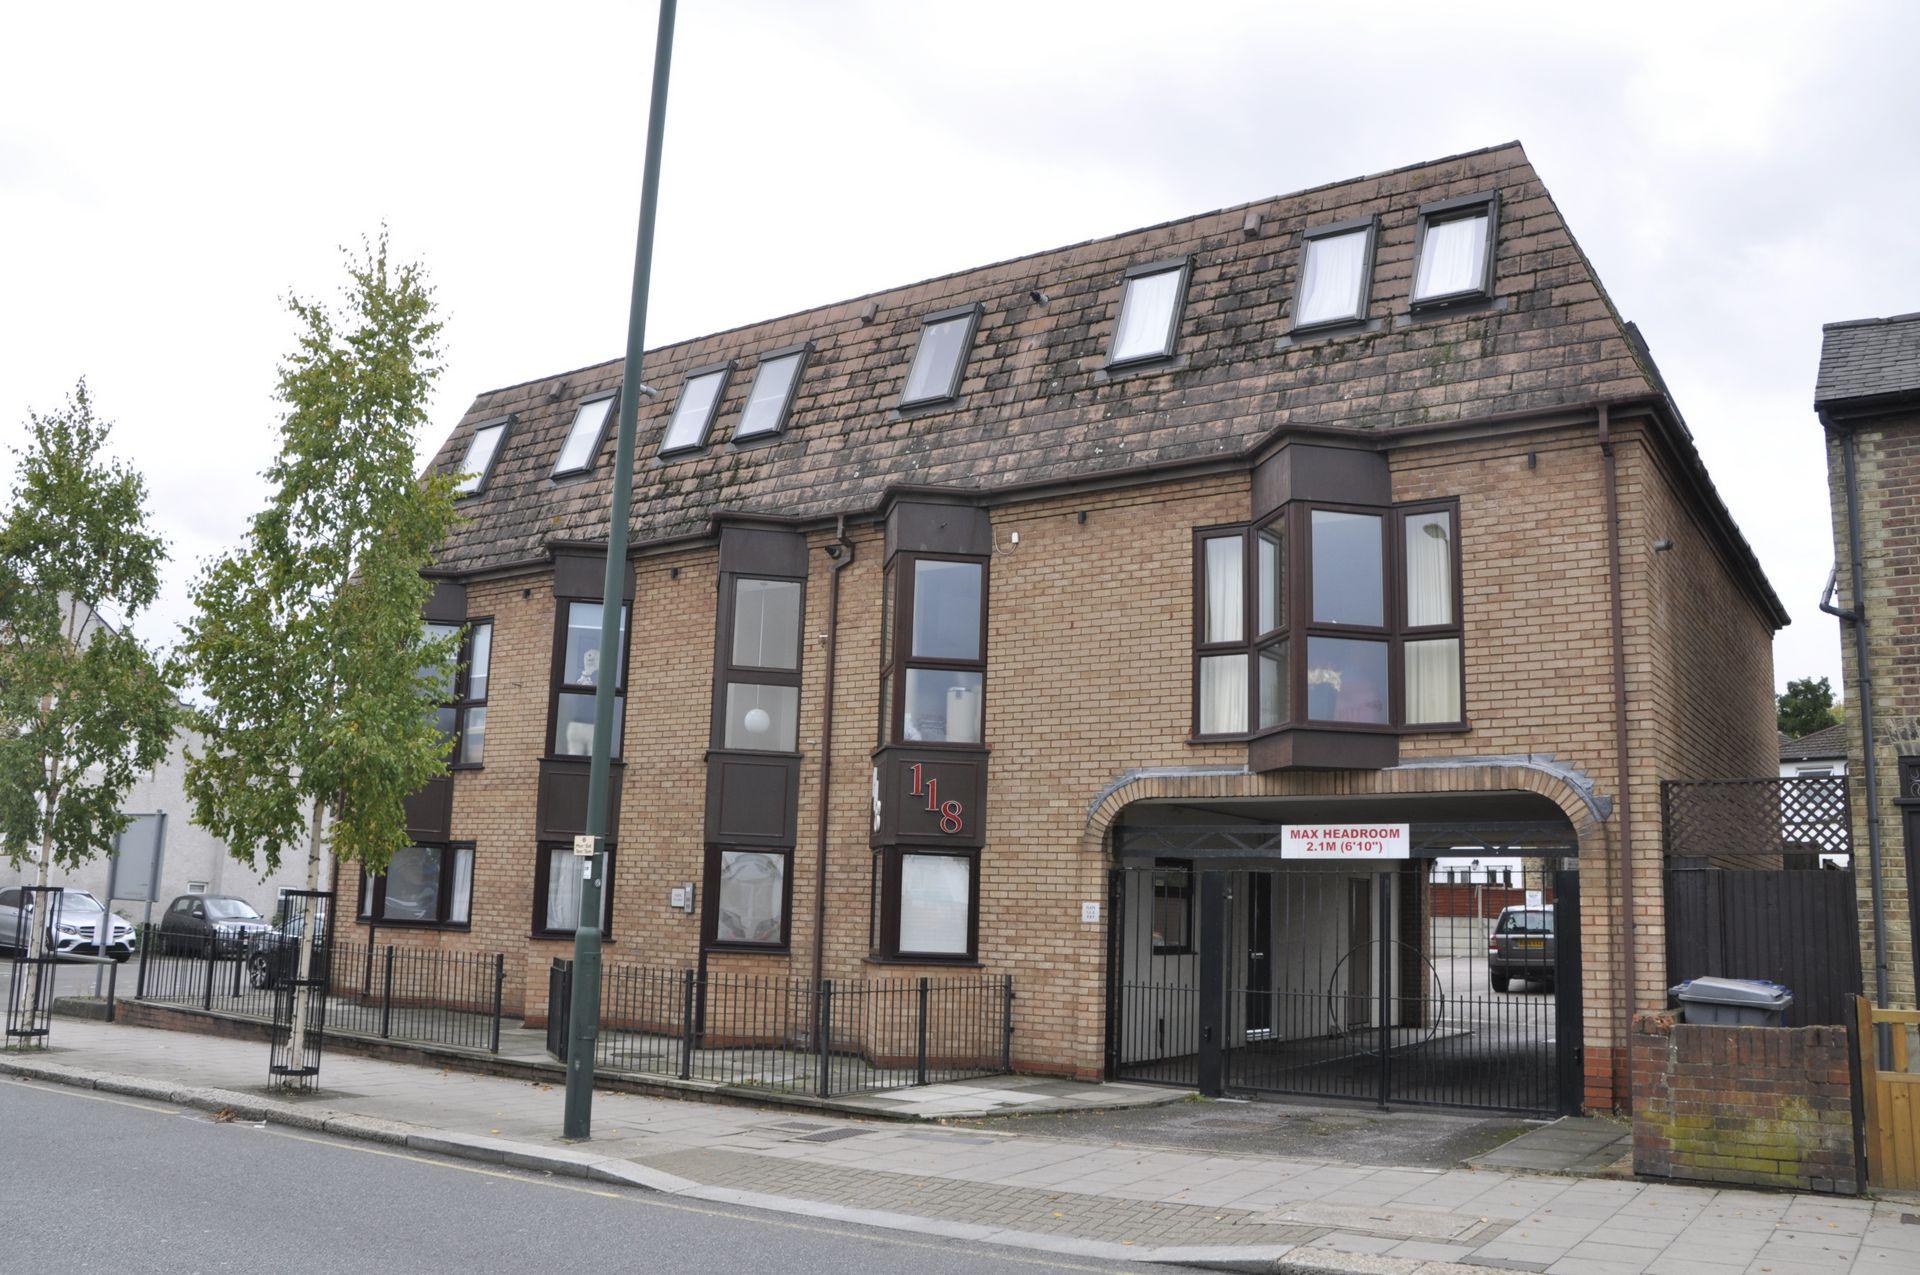 East Barnet Road  New Barnet  Herts  EN4